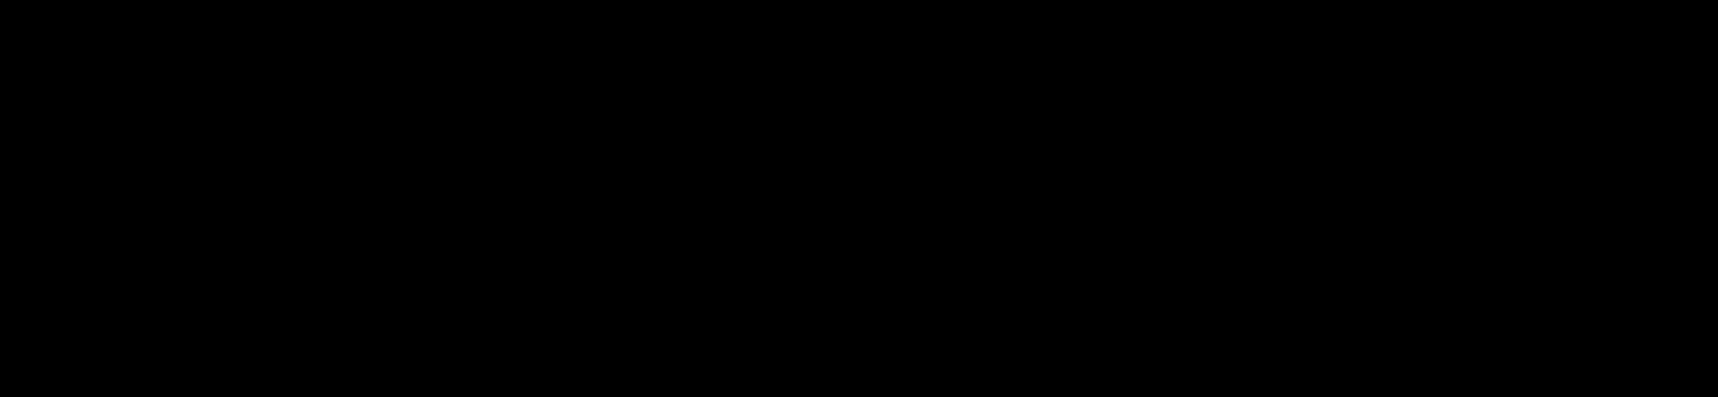 Lumisizer